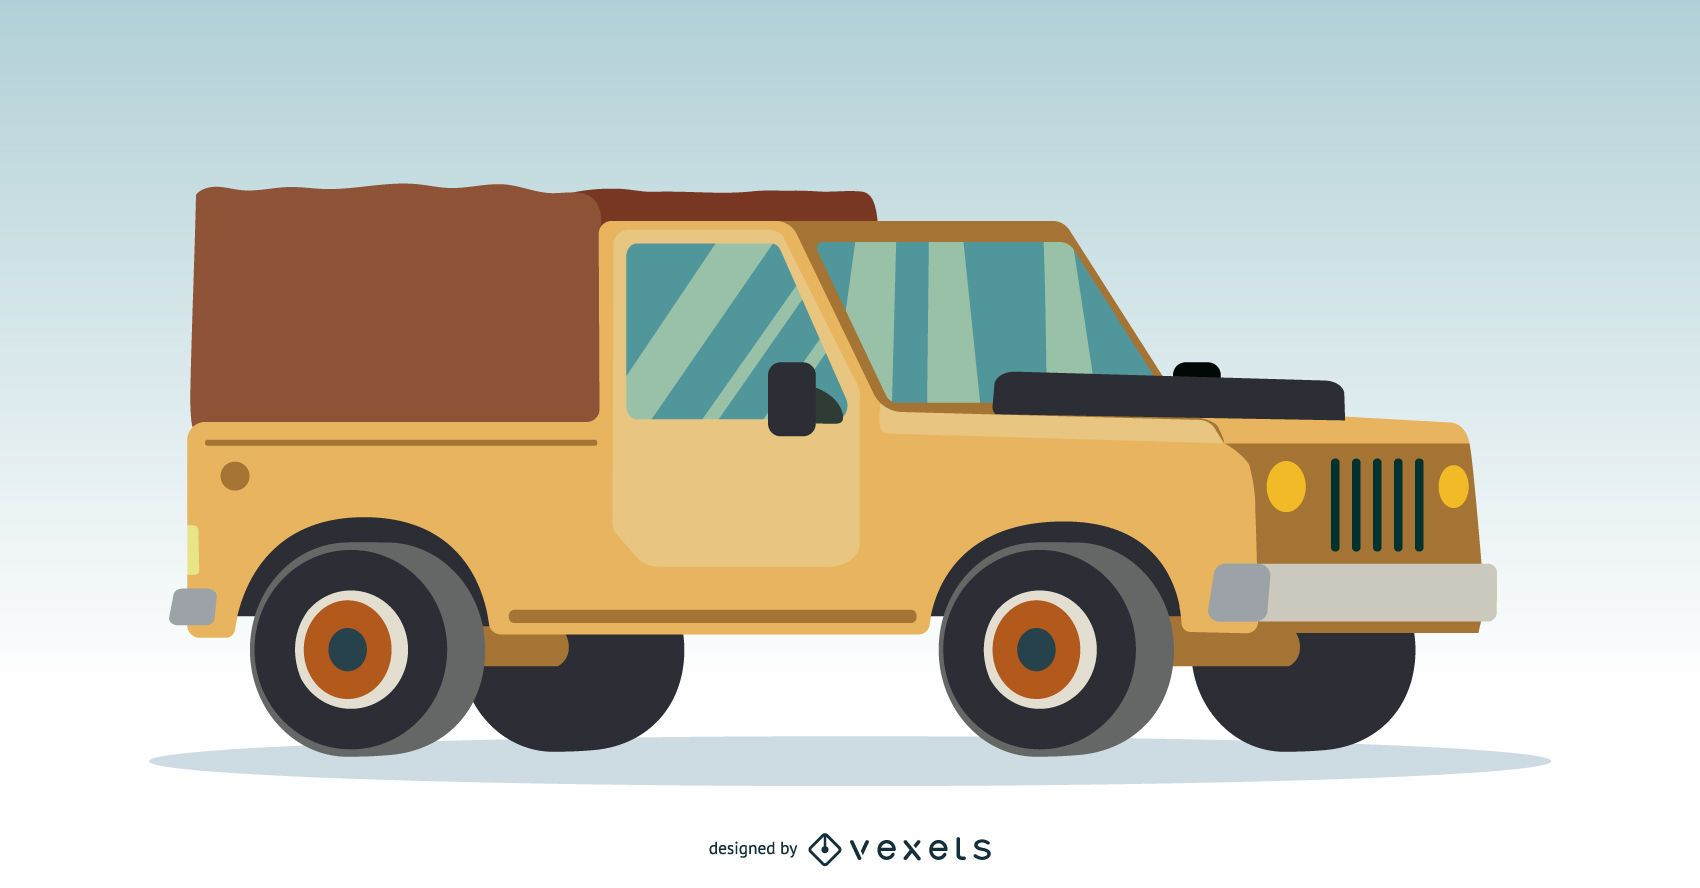 Cream 4x4 truck illustration